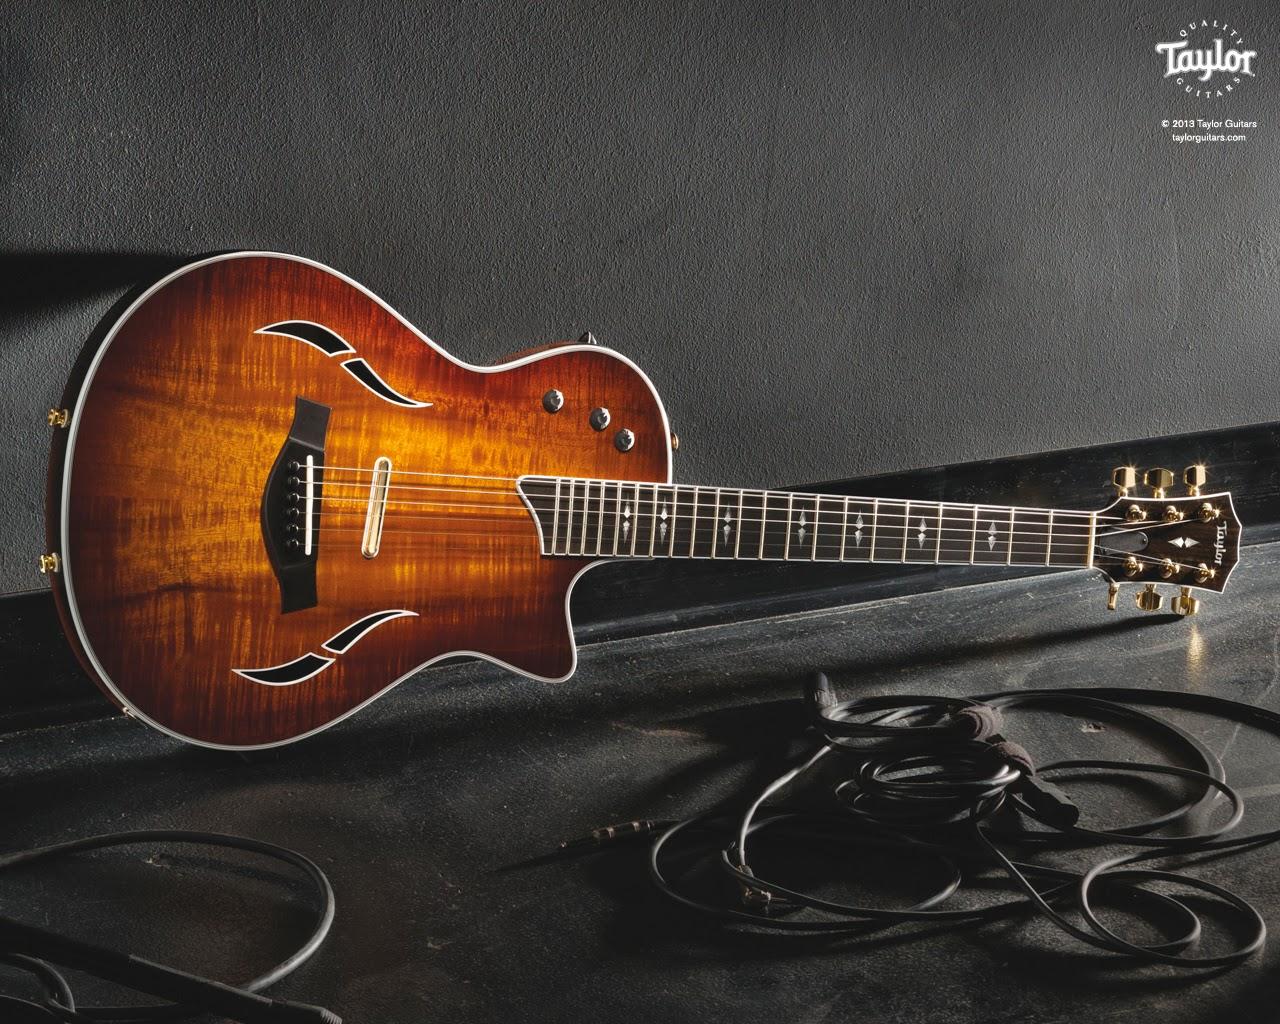 taylor guitars wallpapers - photo #16